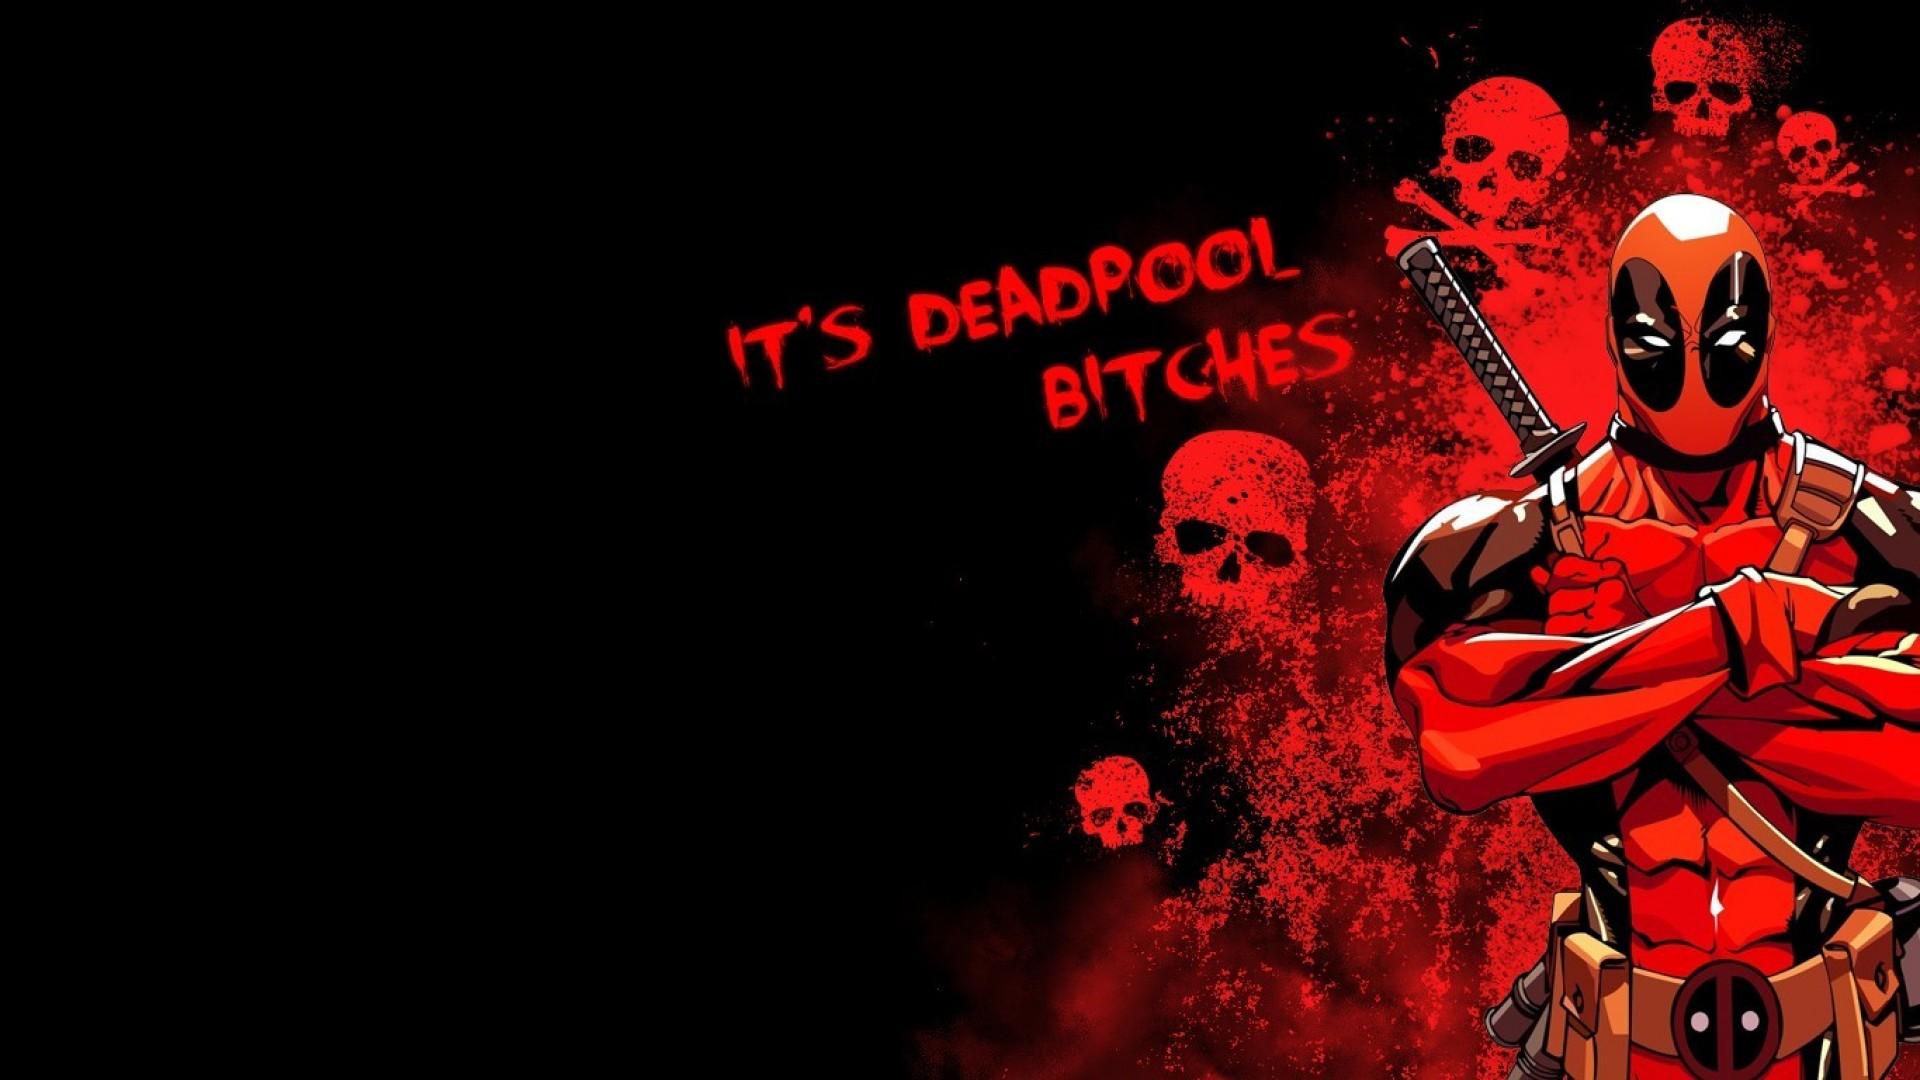 Deadpool Wallpaper HD 1920x1080